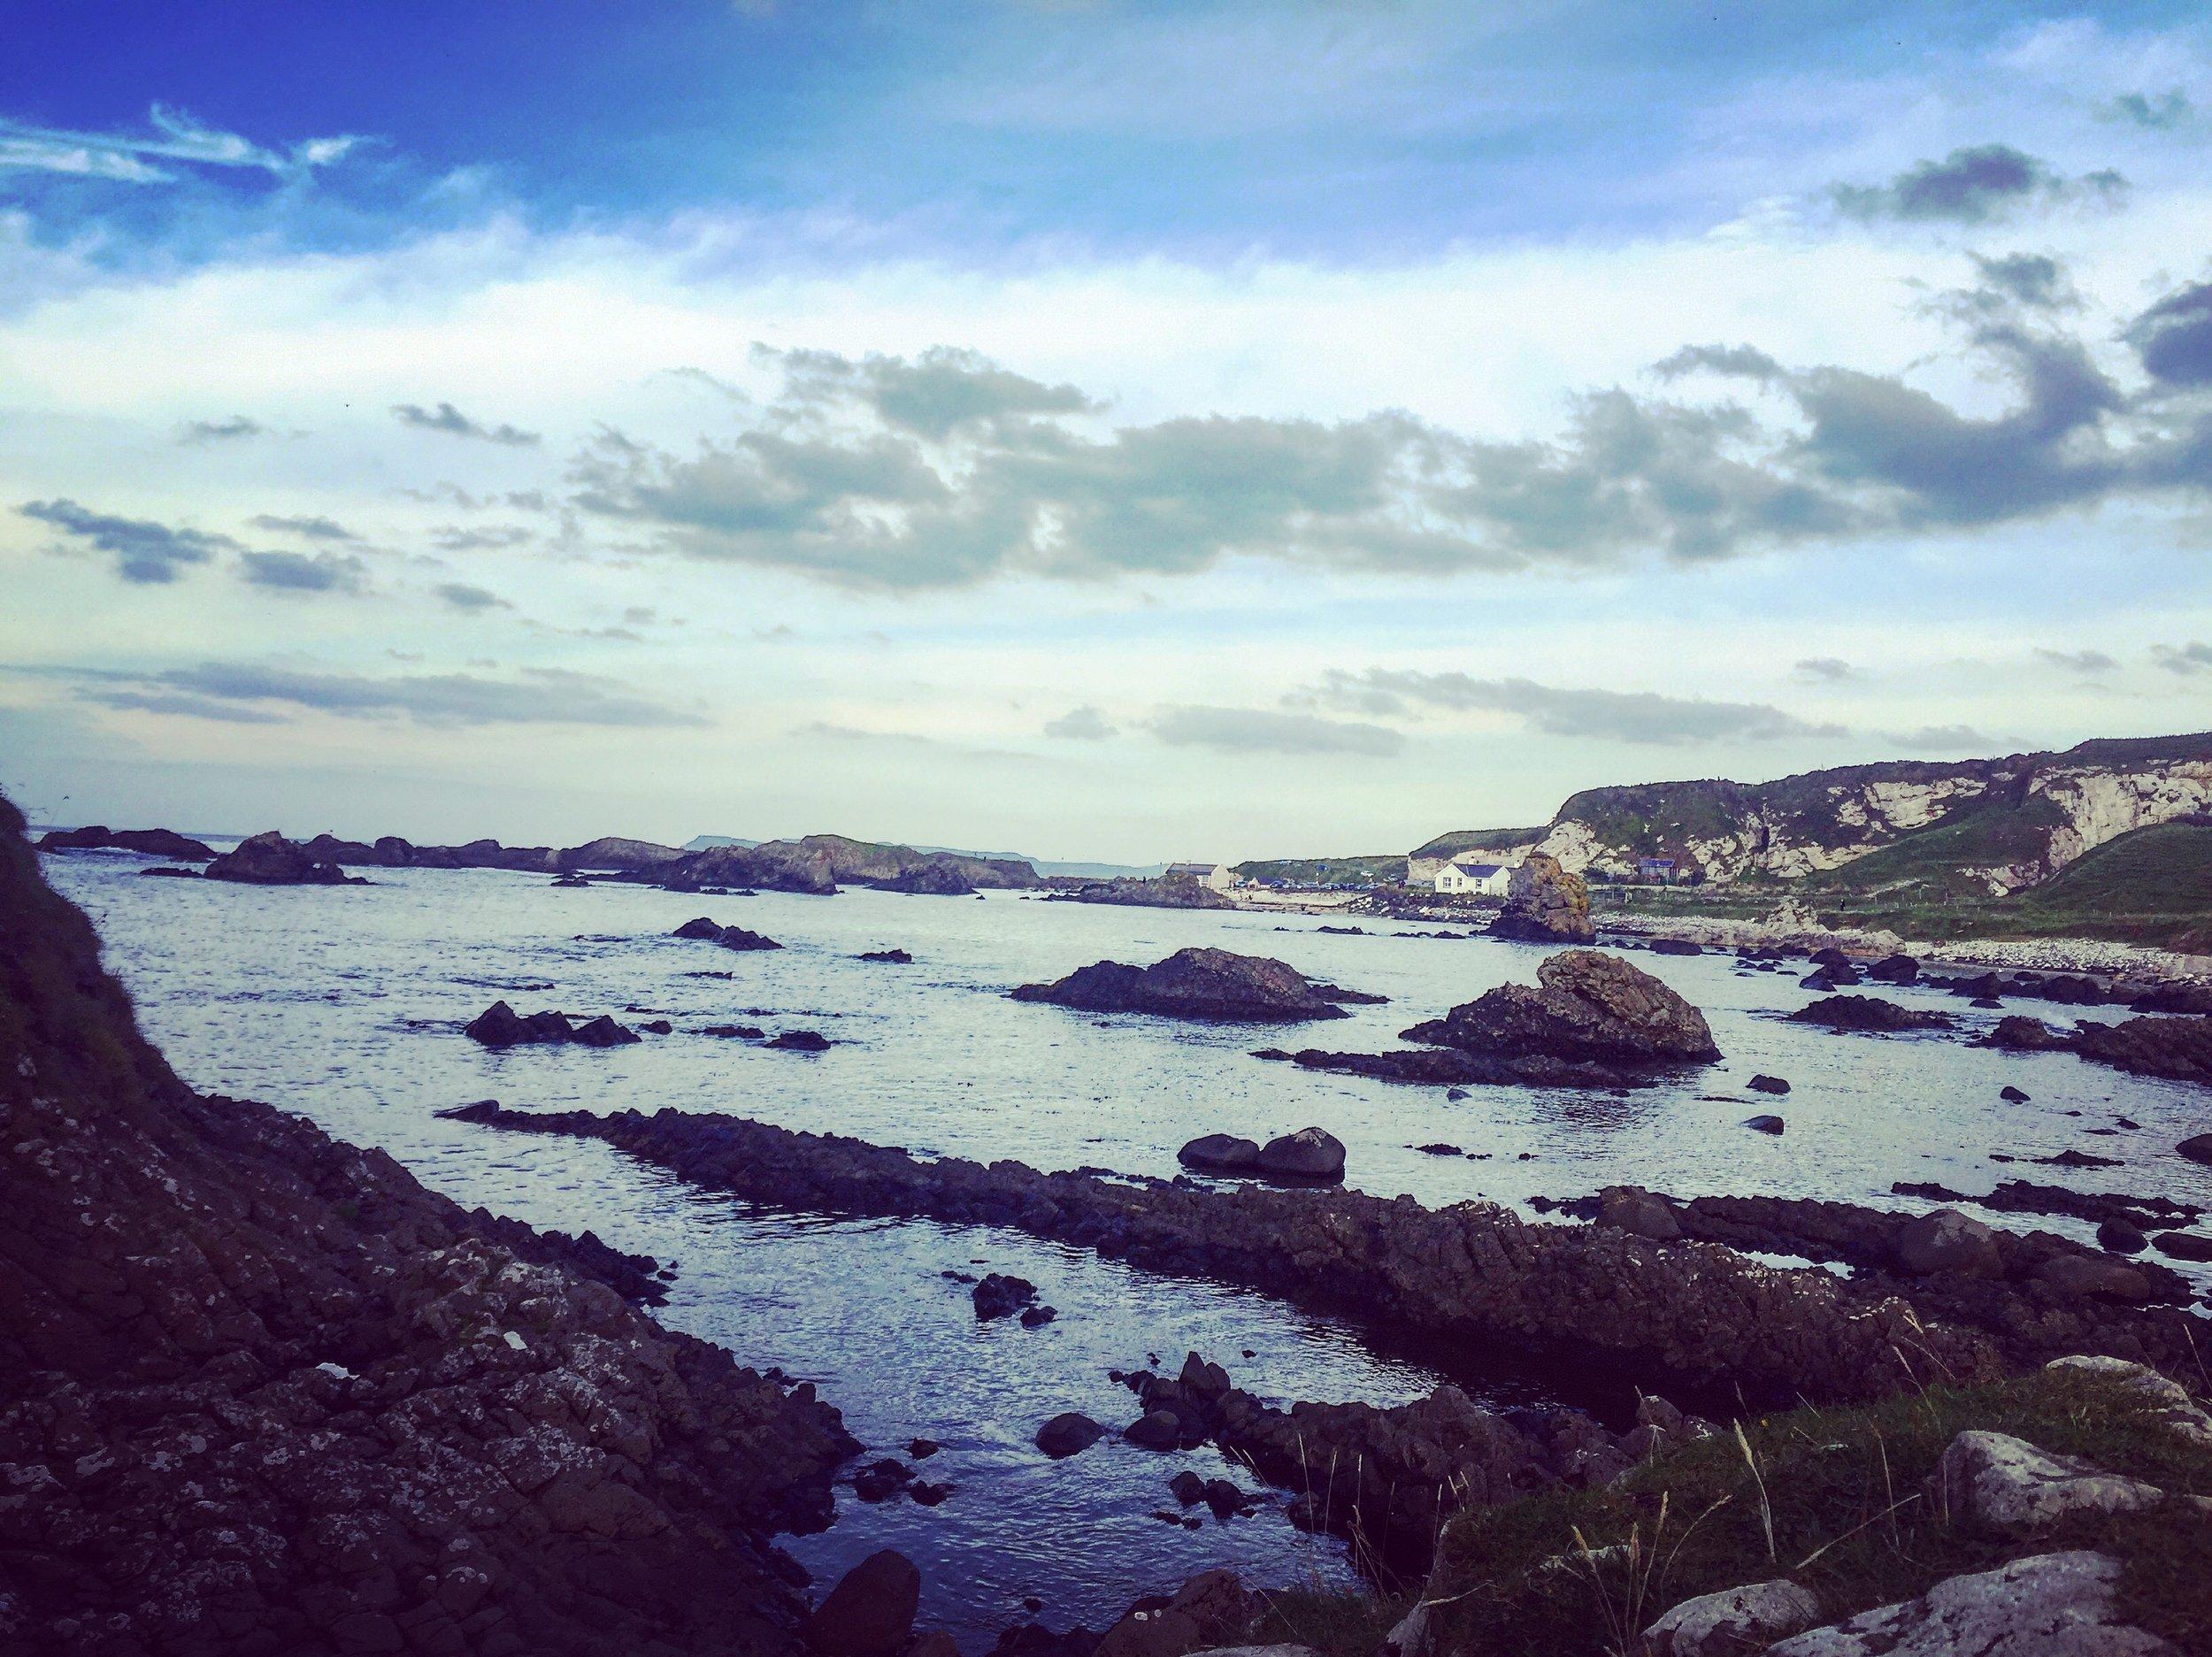 portmuck_harbour_islandmagee_antrim_roadtrip_coast_ni_explorer_niexplorer_northern_ireland_blog.jpg